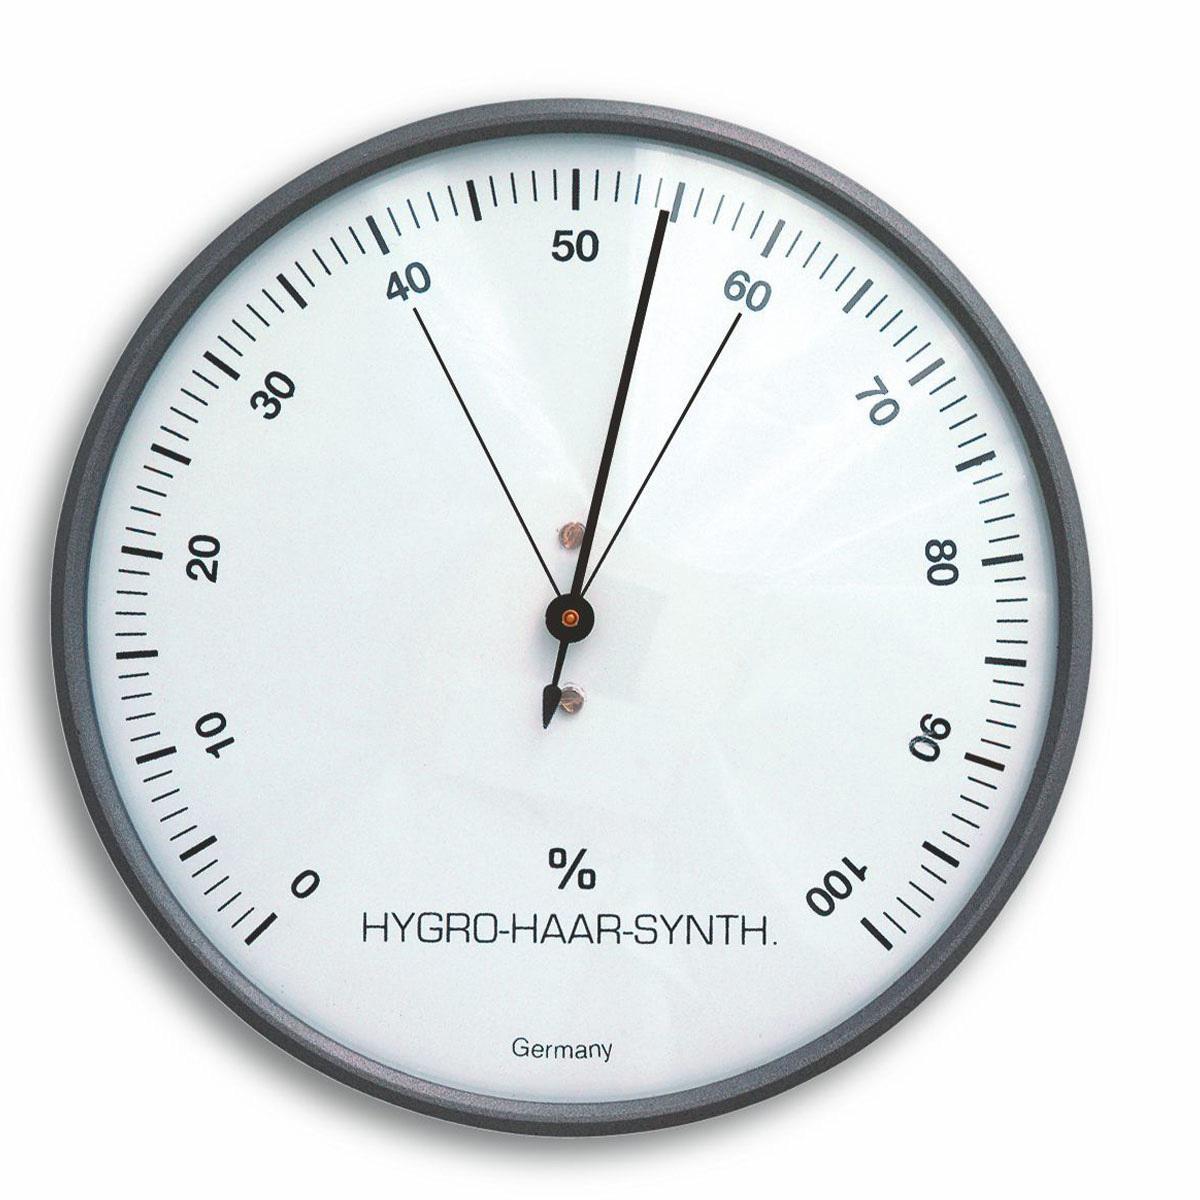 44-2003-analoges-hygrometer-1200x1200px.jpg